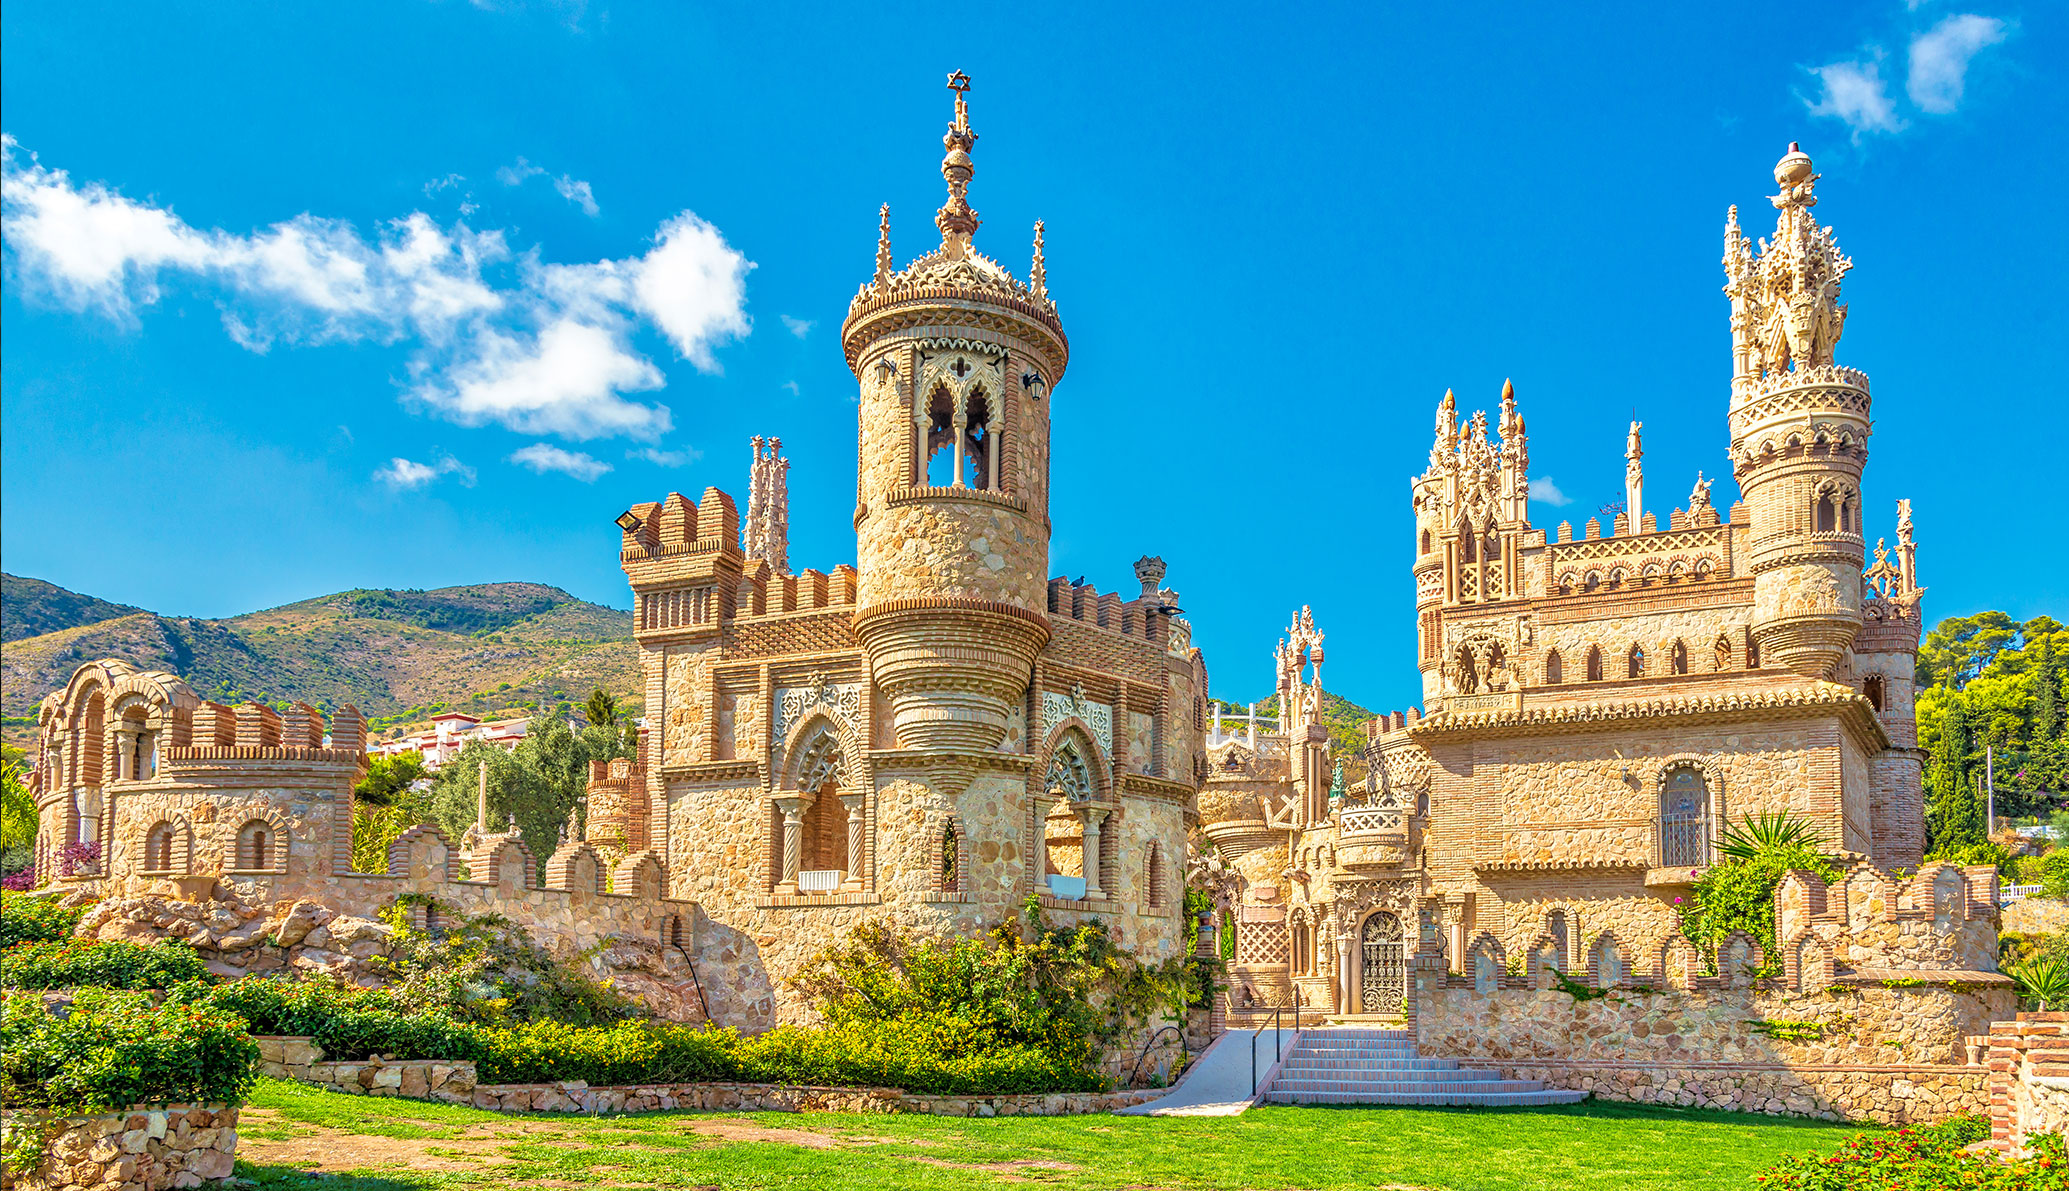 Let's discover the smallest church in the world in the Castillo de Colomares